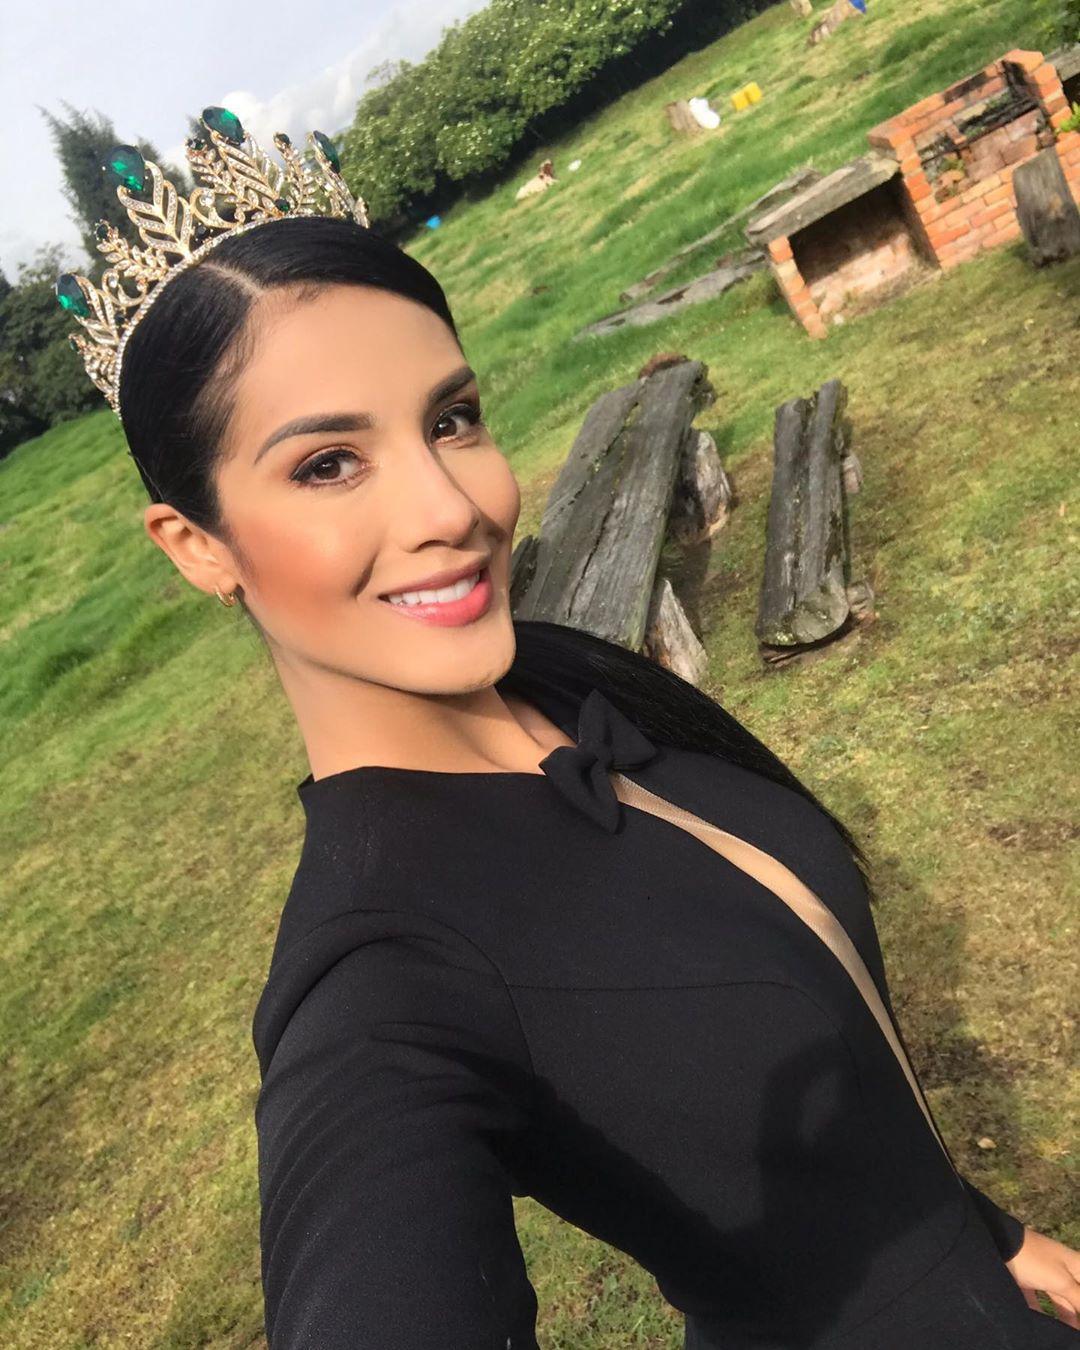 yenny katherine carrillo, top 20 de miss earth 2019/reyna mundial banano 2017. - Página 5 69583610